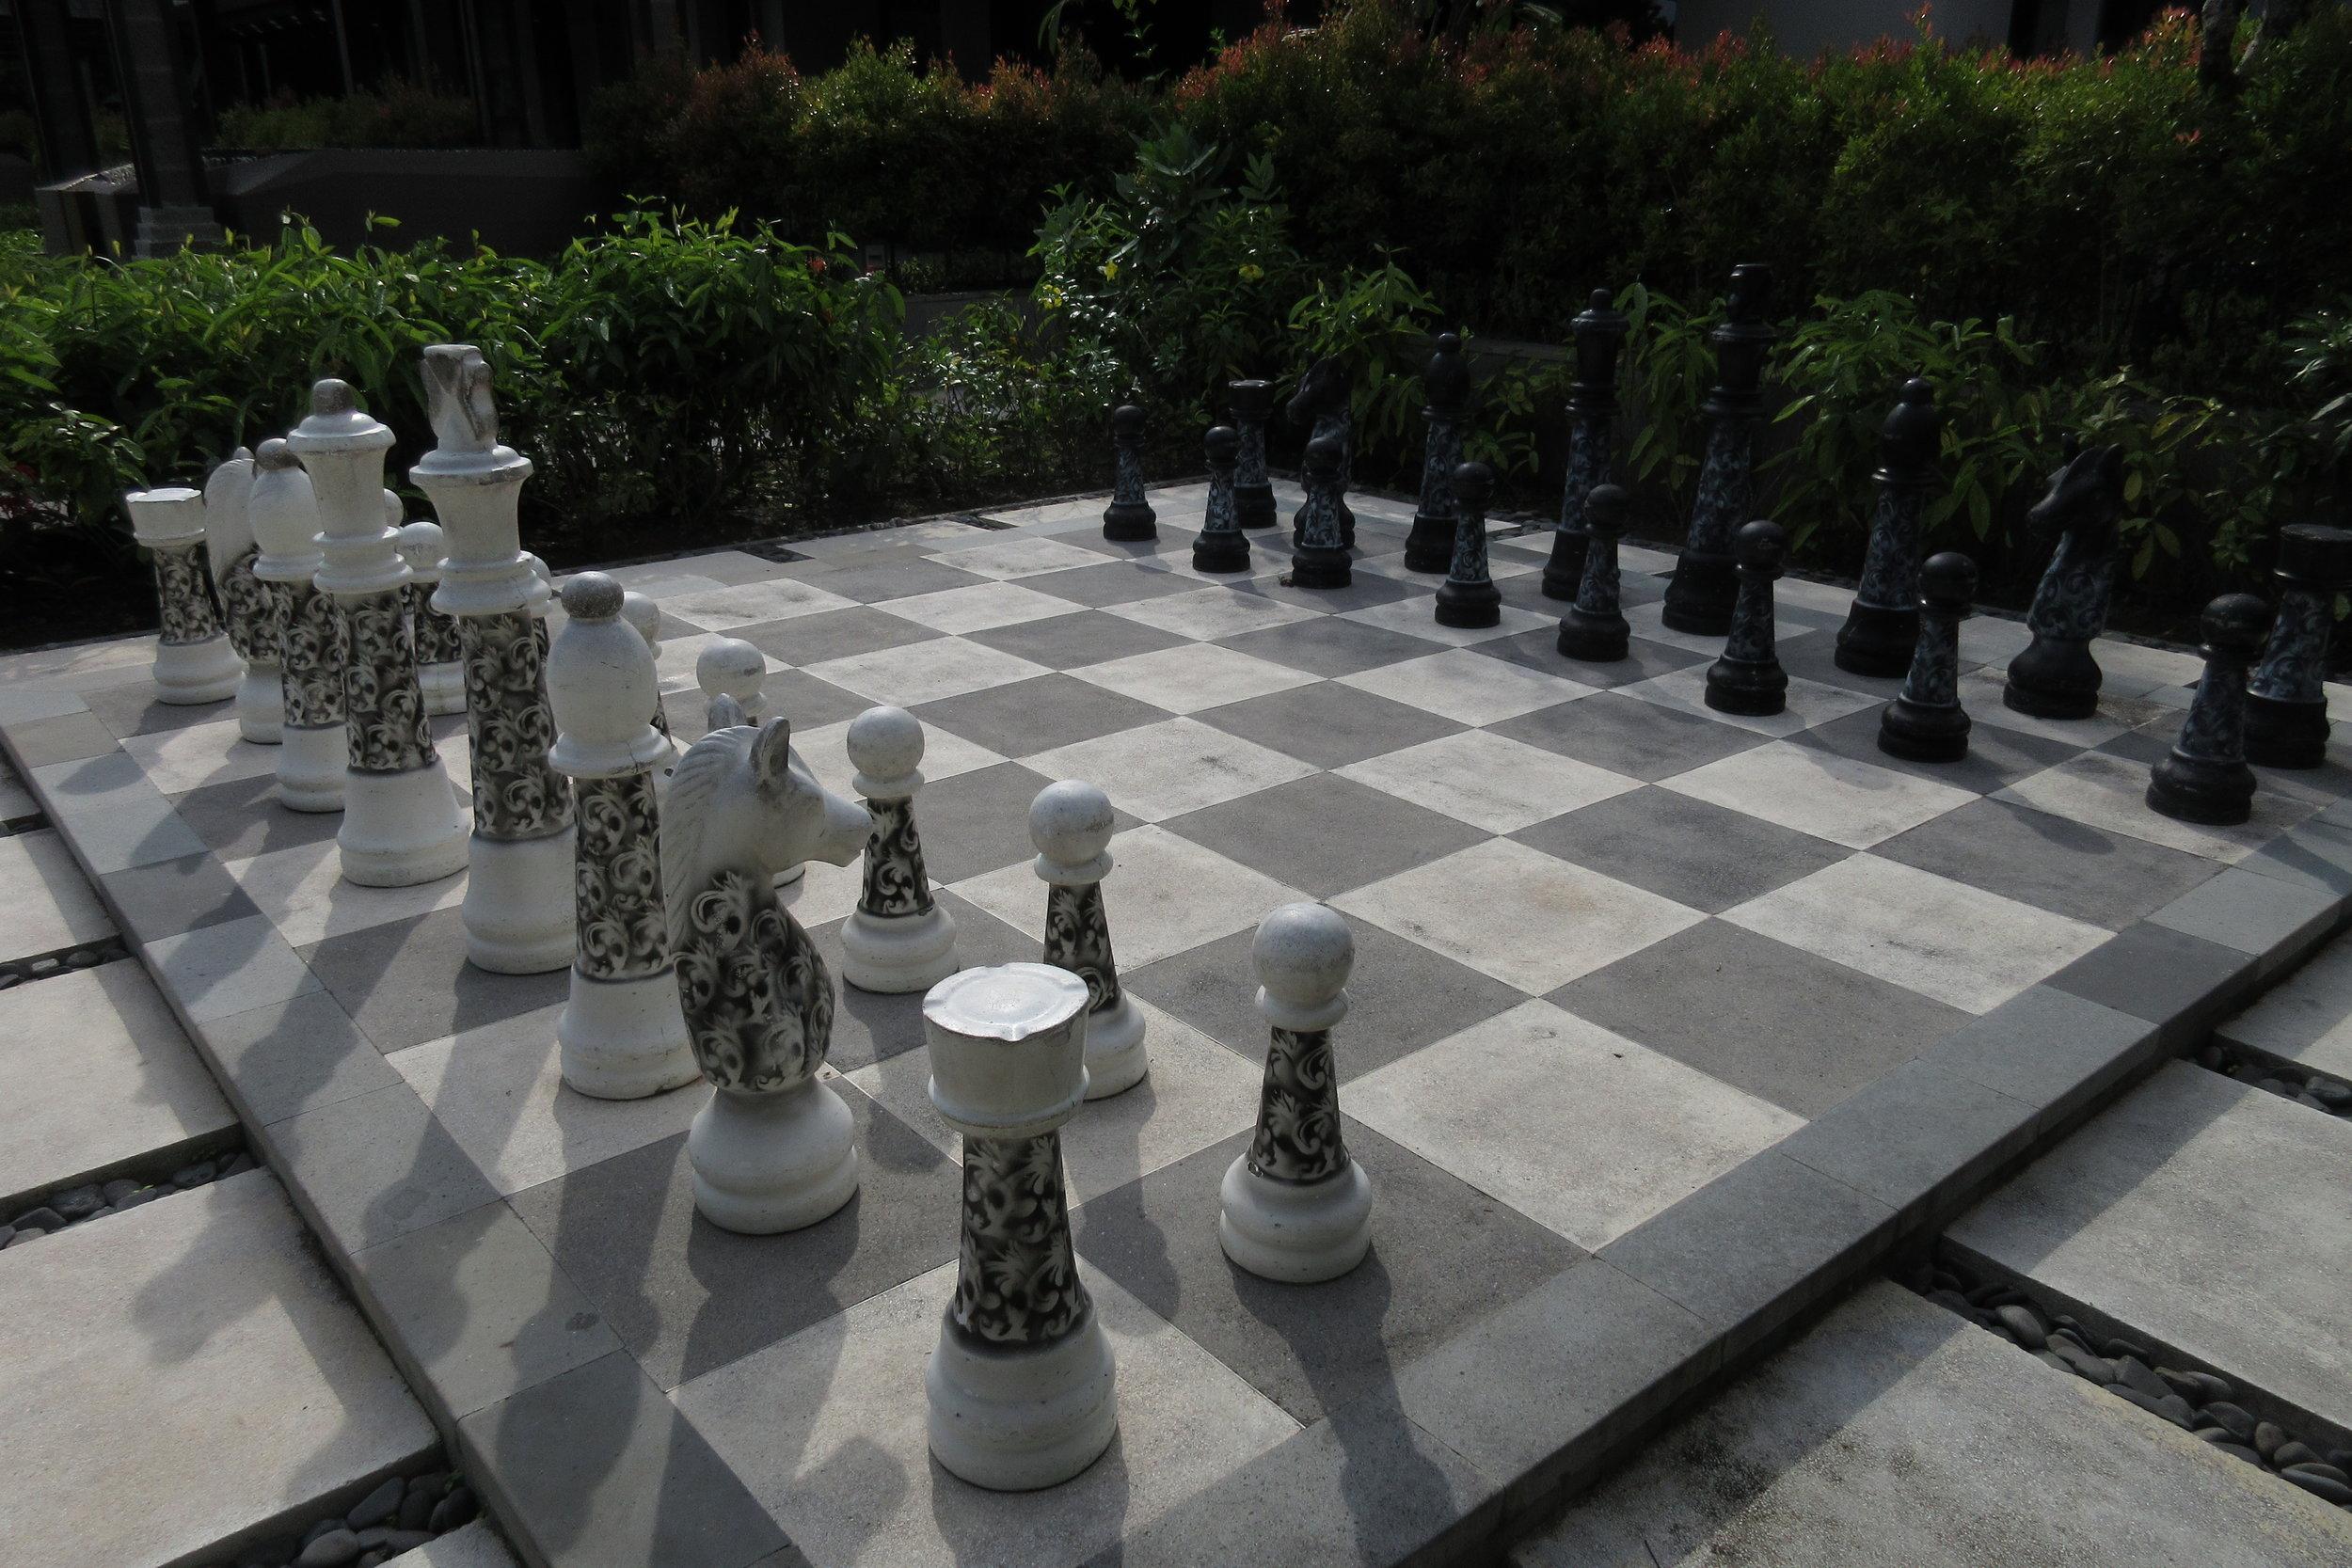 The Ritz-Carlton, Bali – Life-sized chessboard